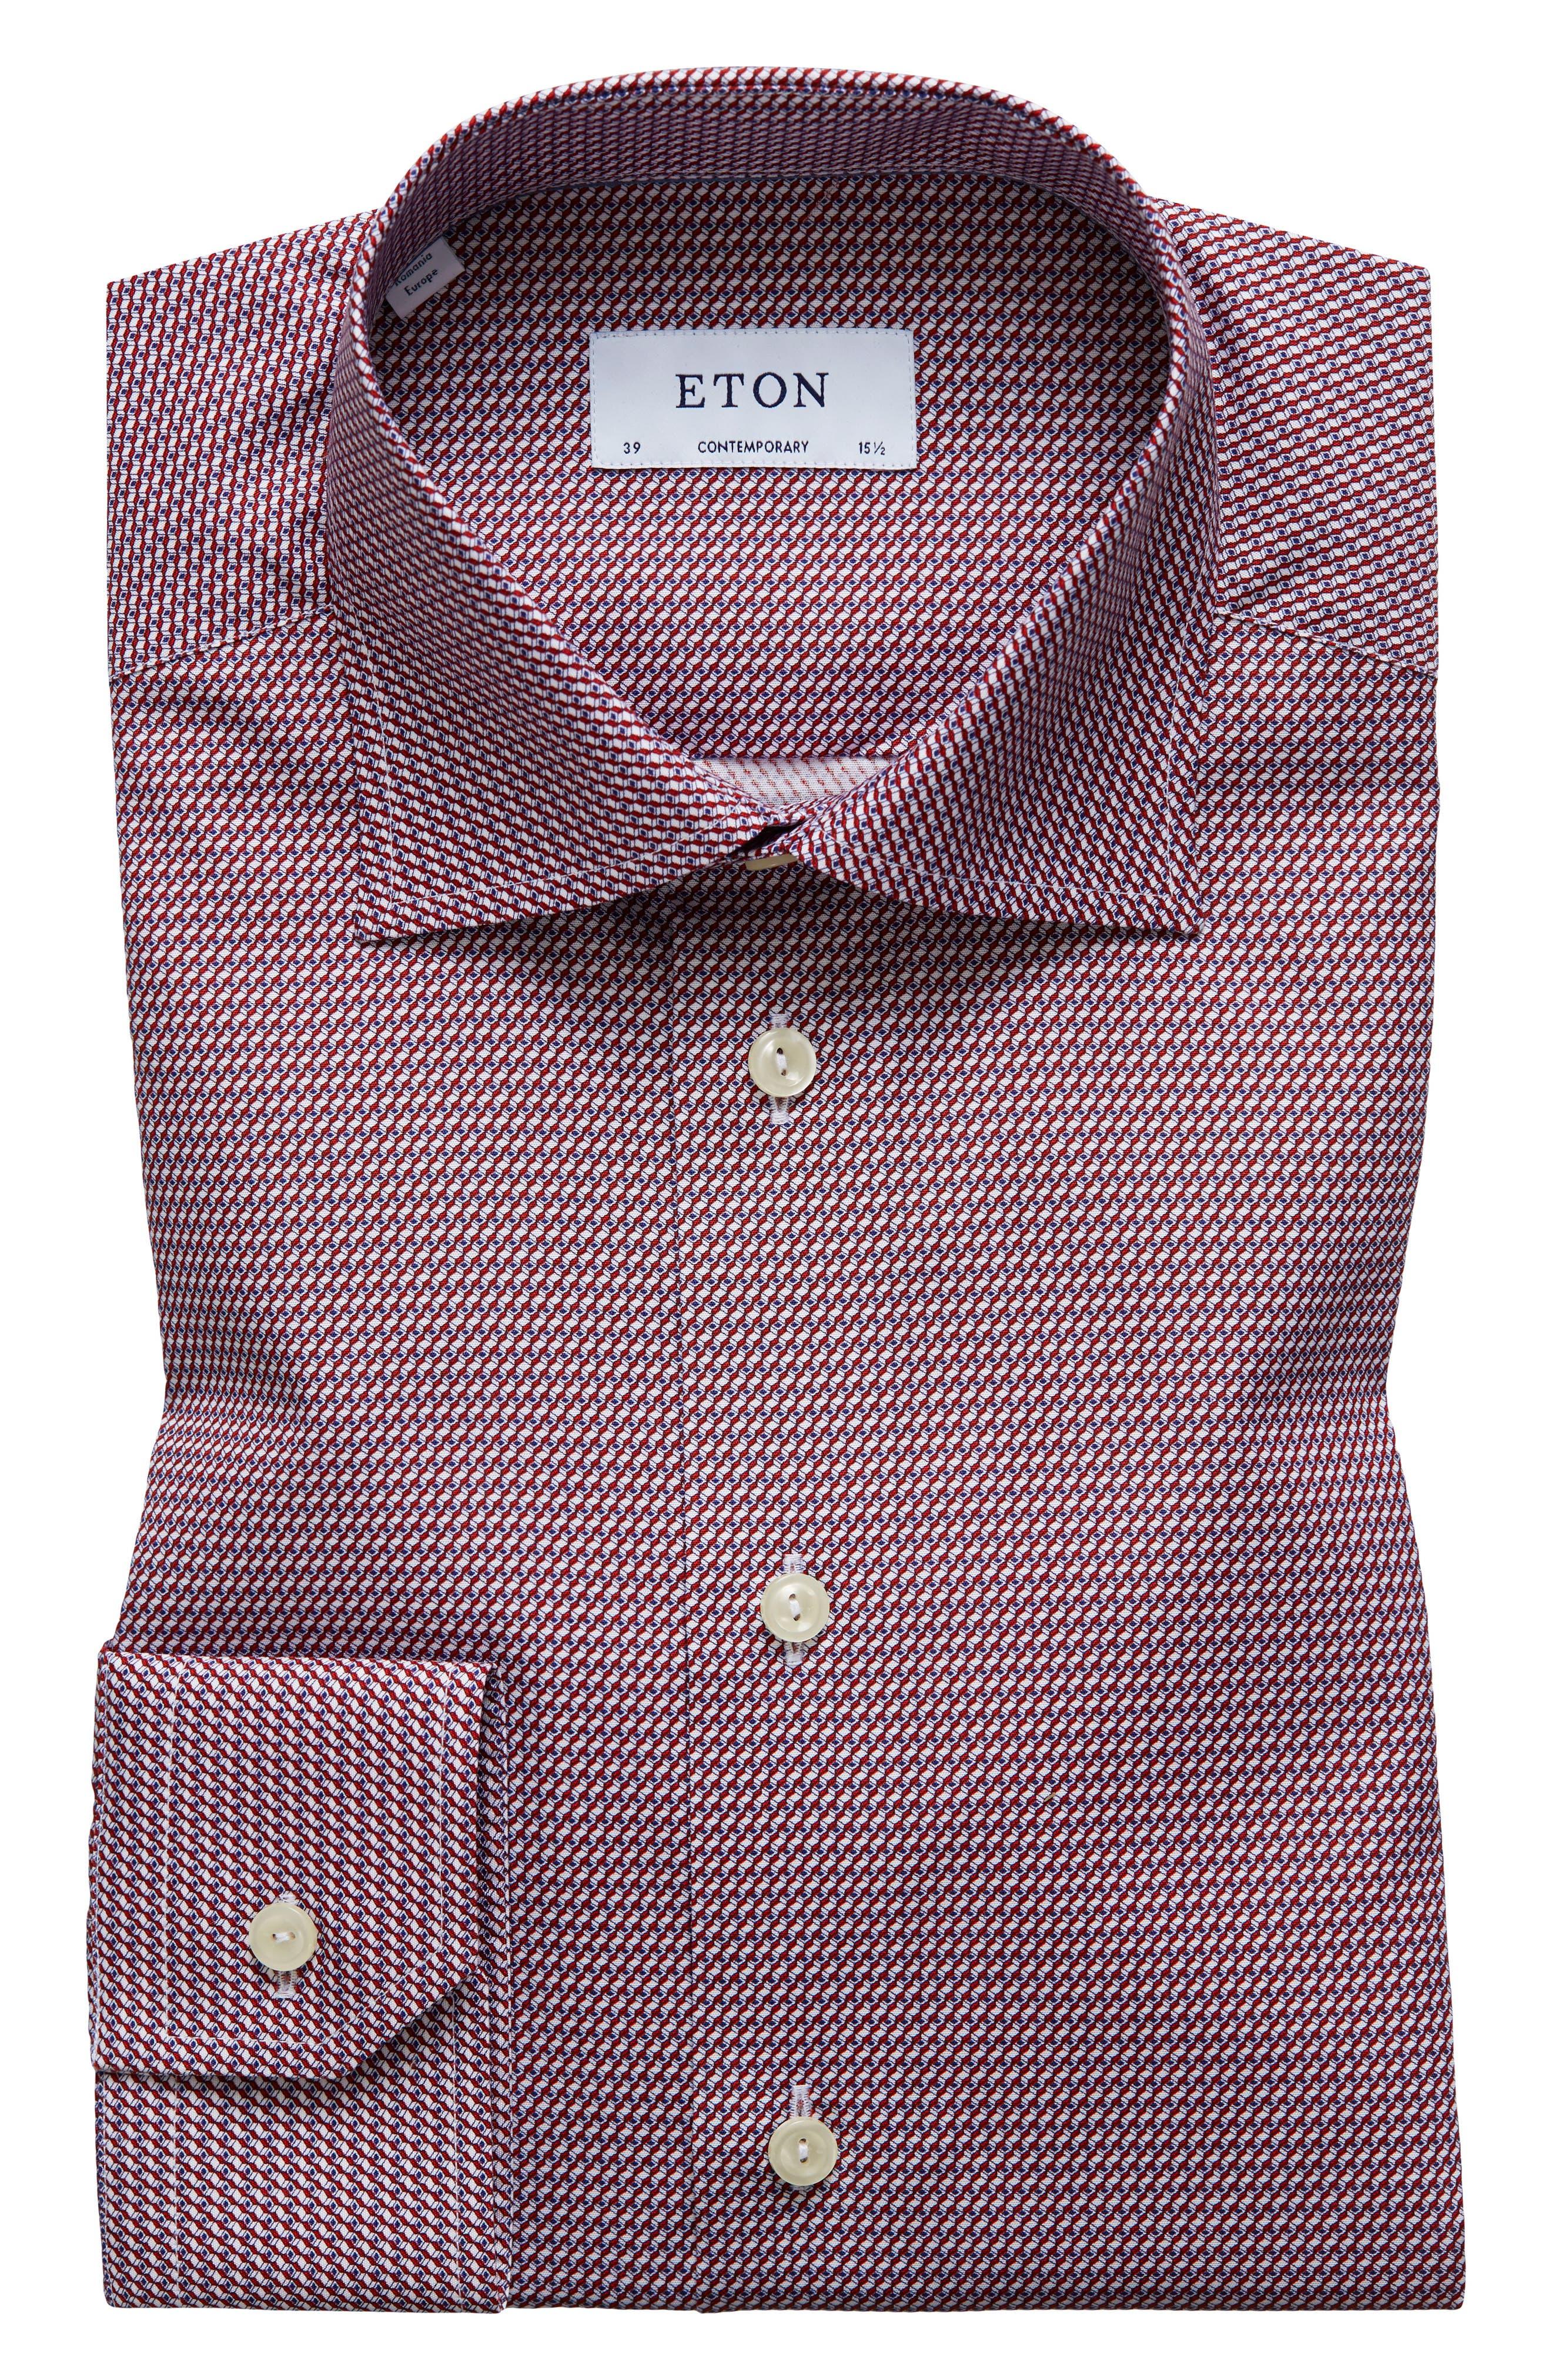 Eton Contemporary Fit Geometric Dress Shirt